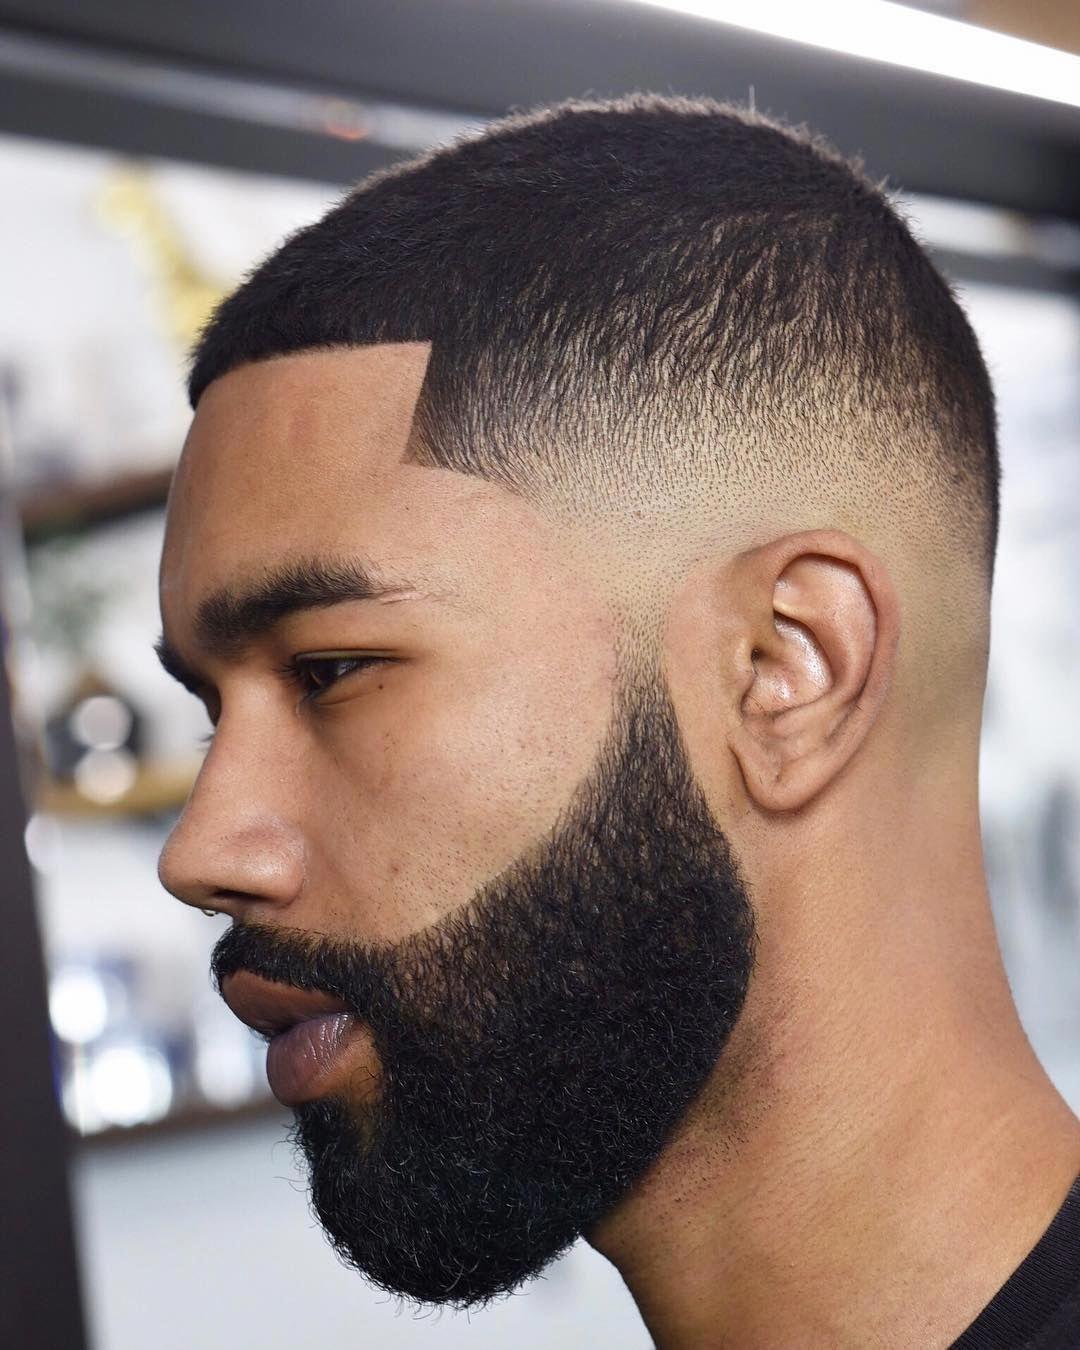 33 Best Men S Fade Haircuts Short To Medium Hair Lengths Mens Haircuts Fade Curly Hair Men Fade Haircut